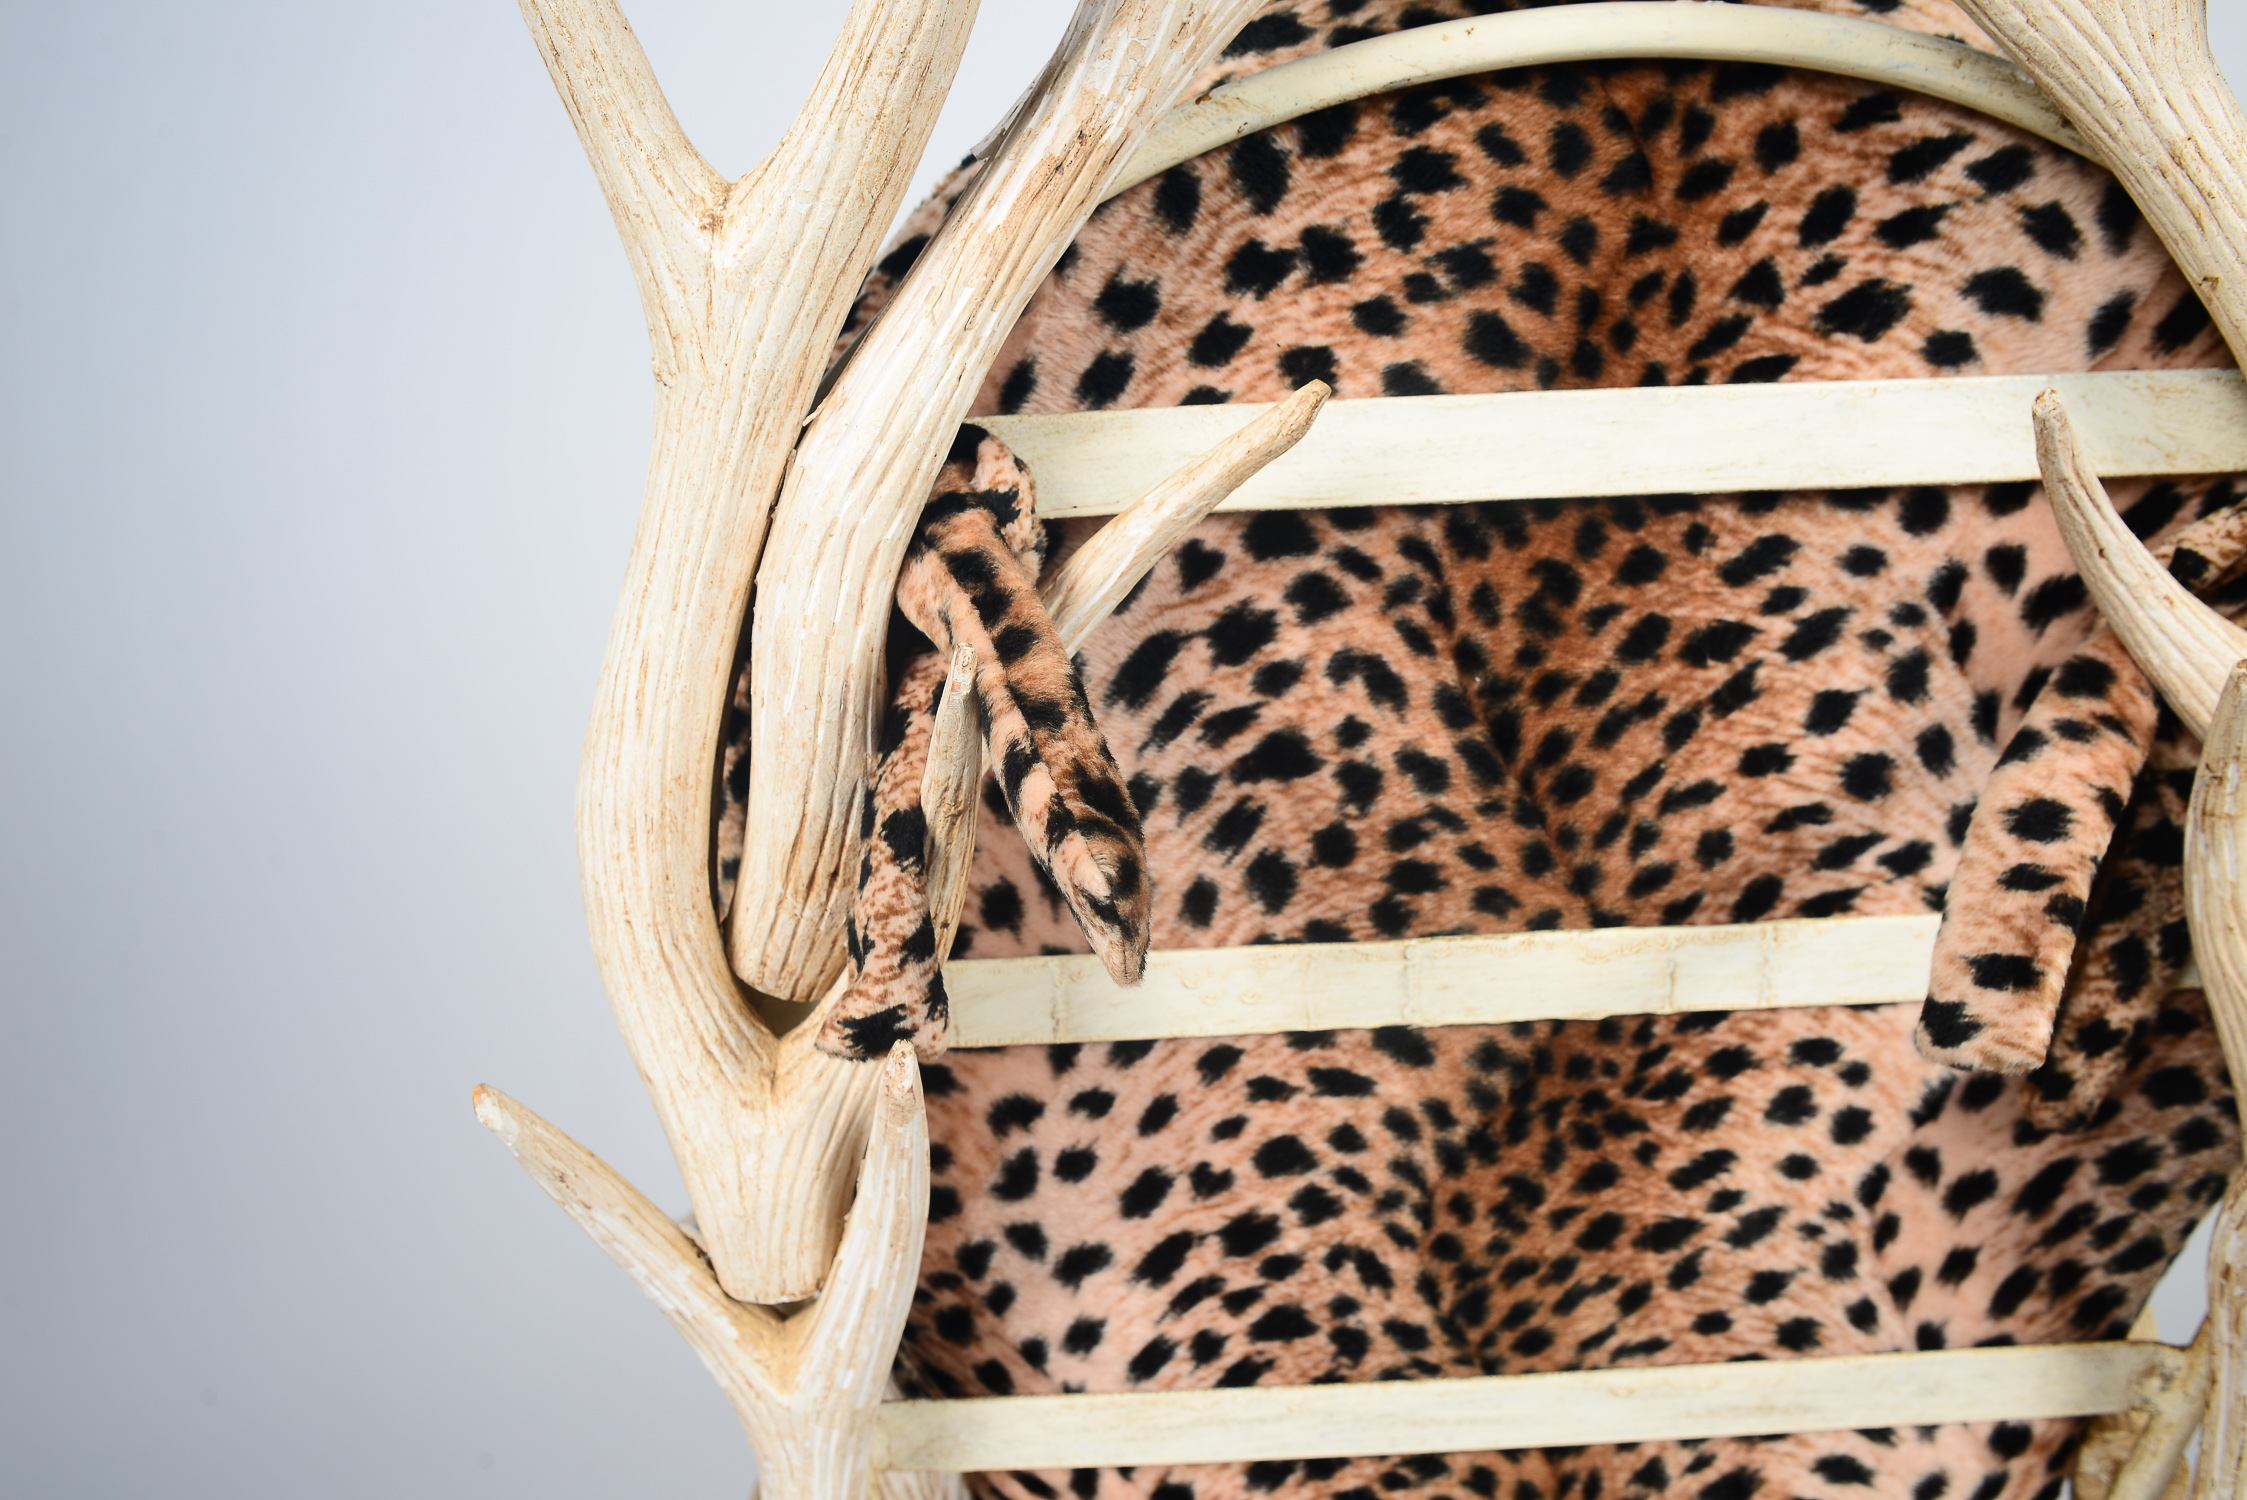 leopard high heel shoe chair swing shops near me decorative print faux antler ebth